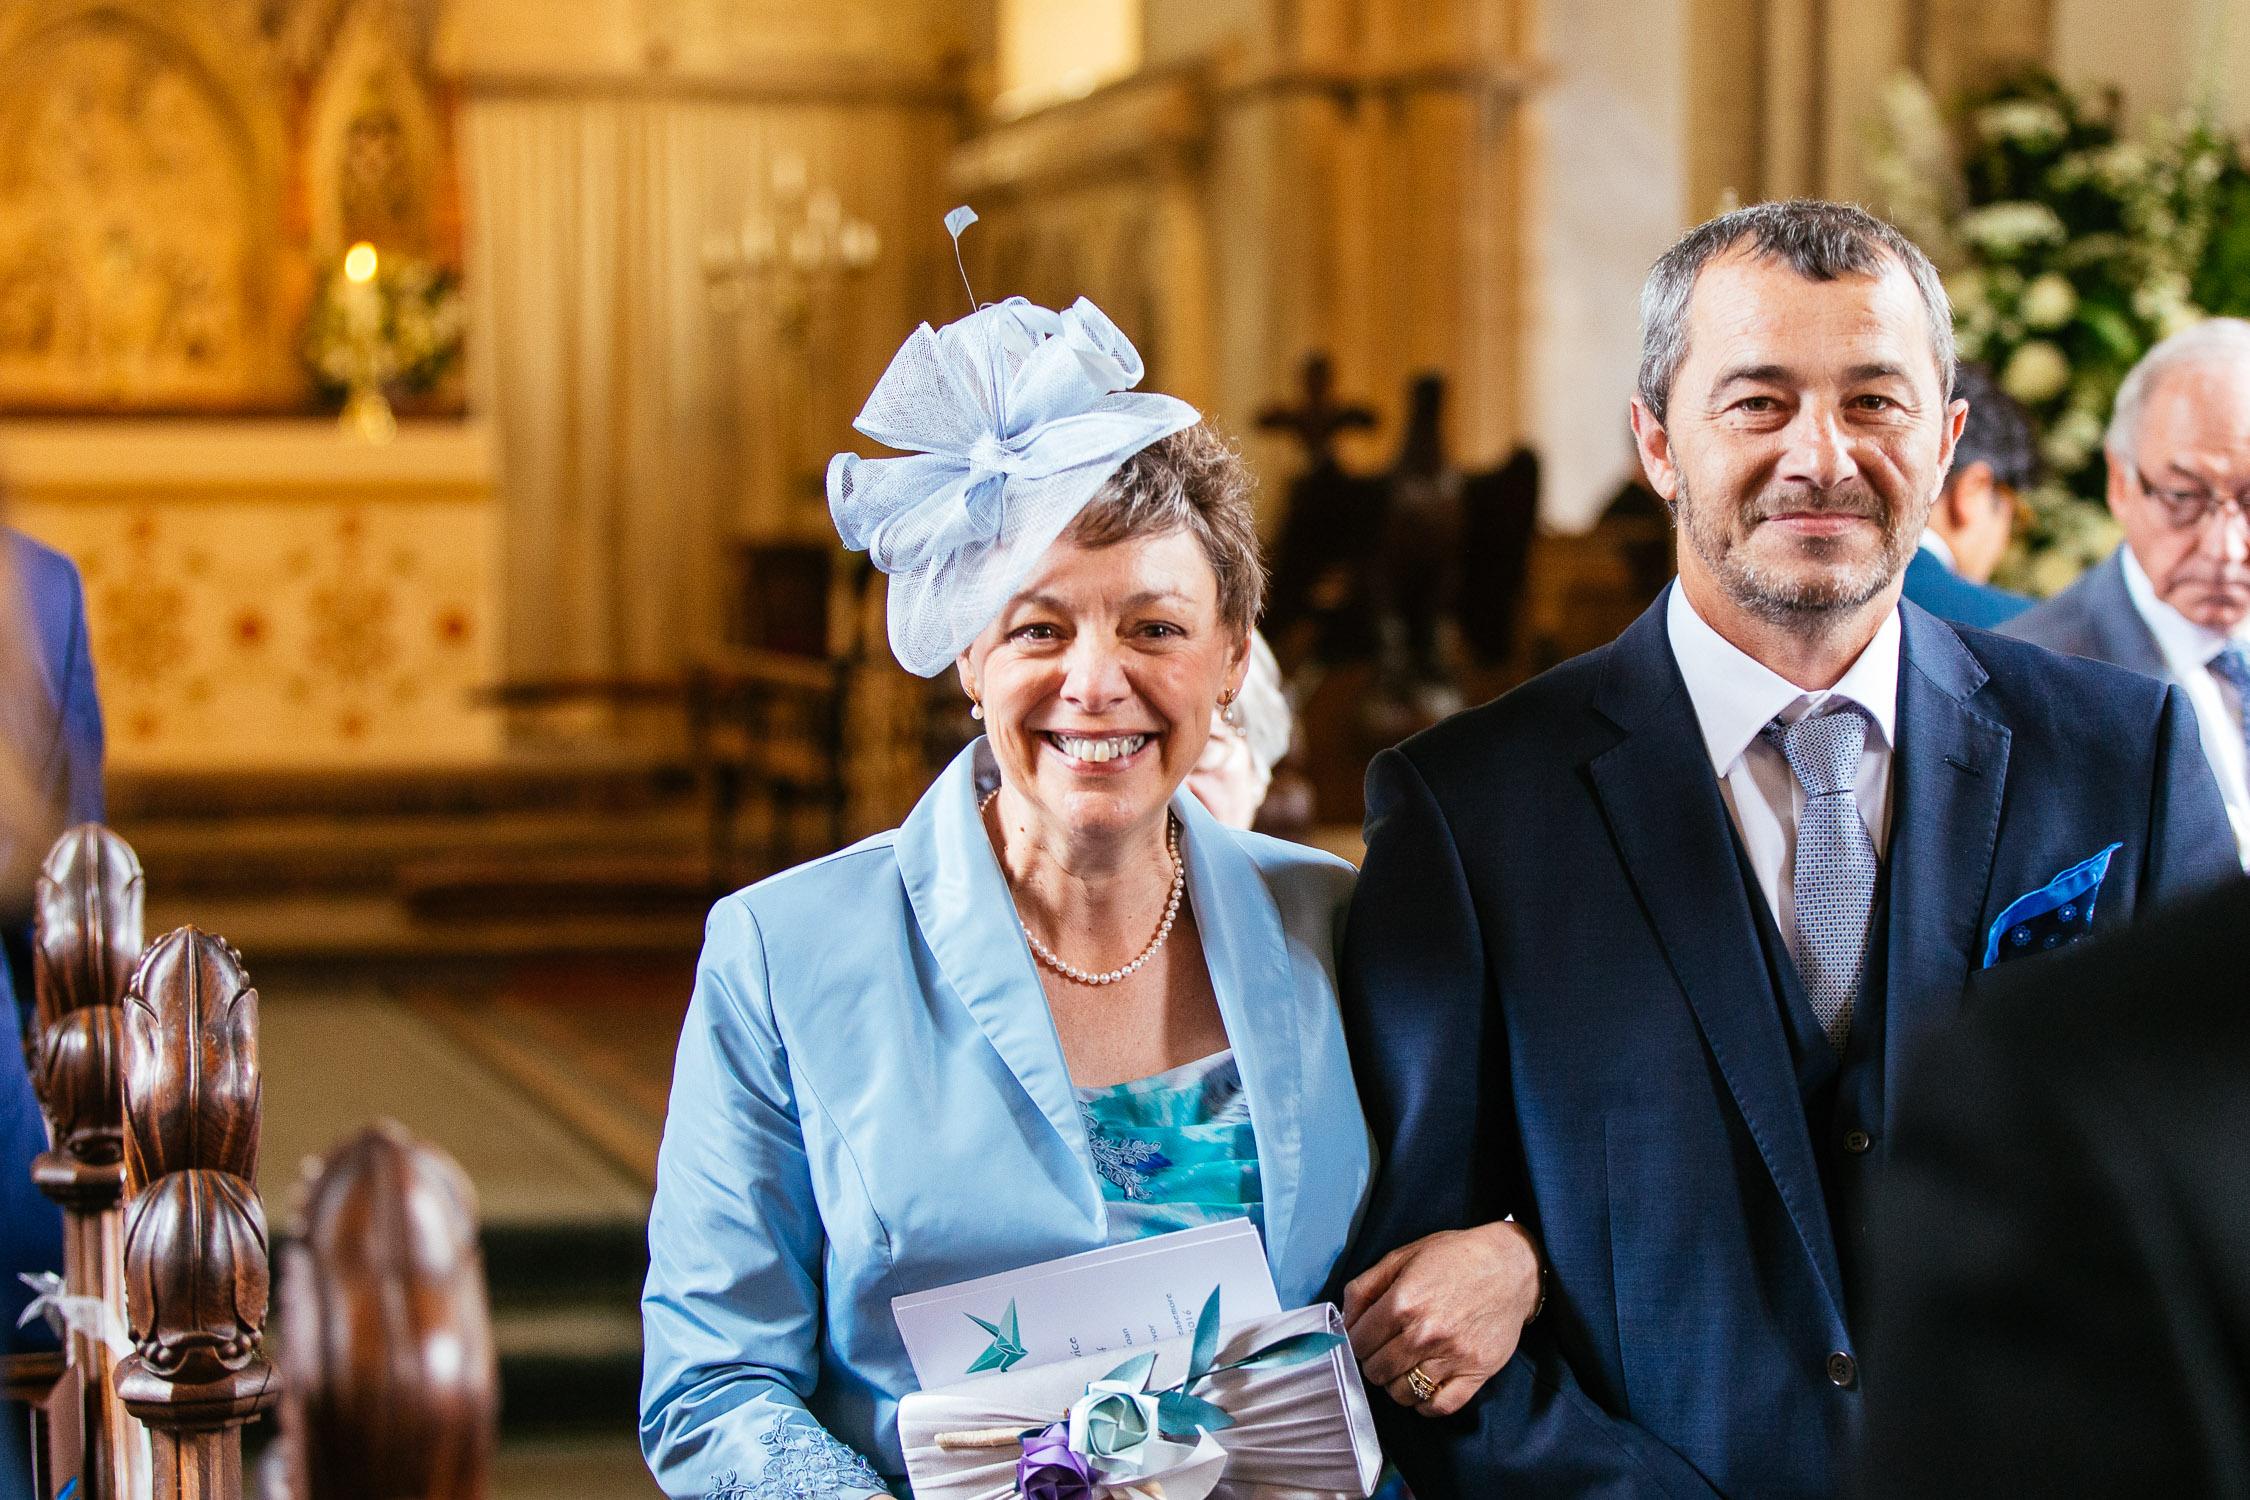 Lizi-and-Mark-Wedding-Highlights-37.jpg